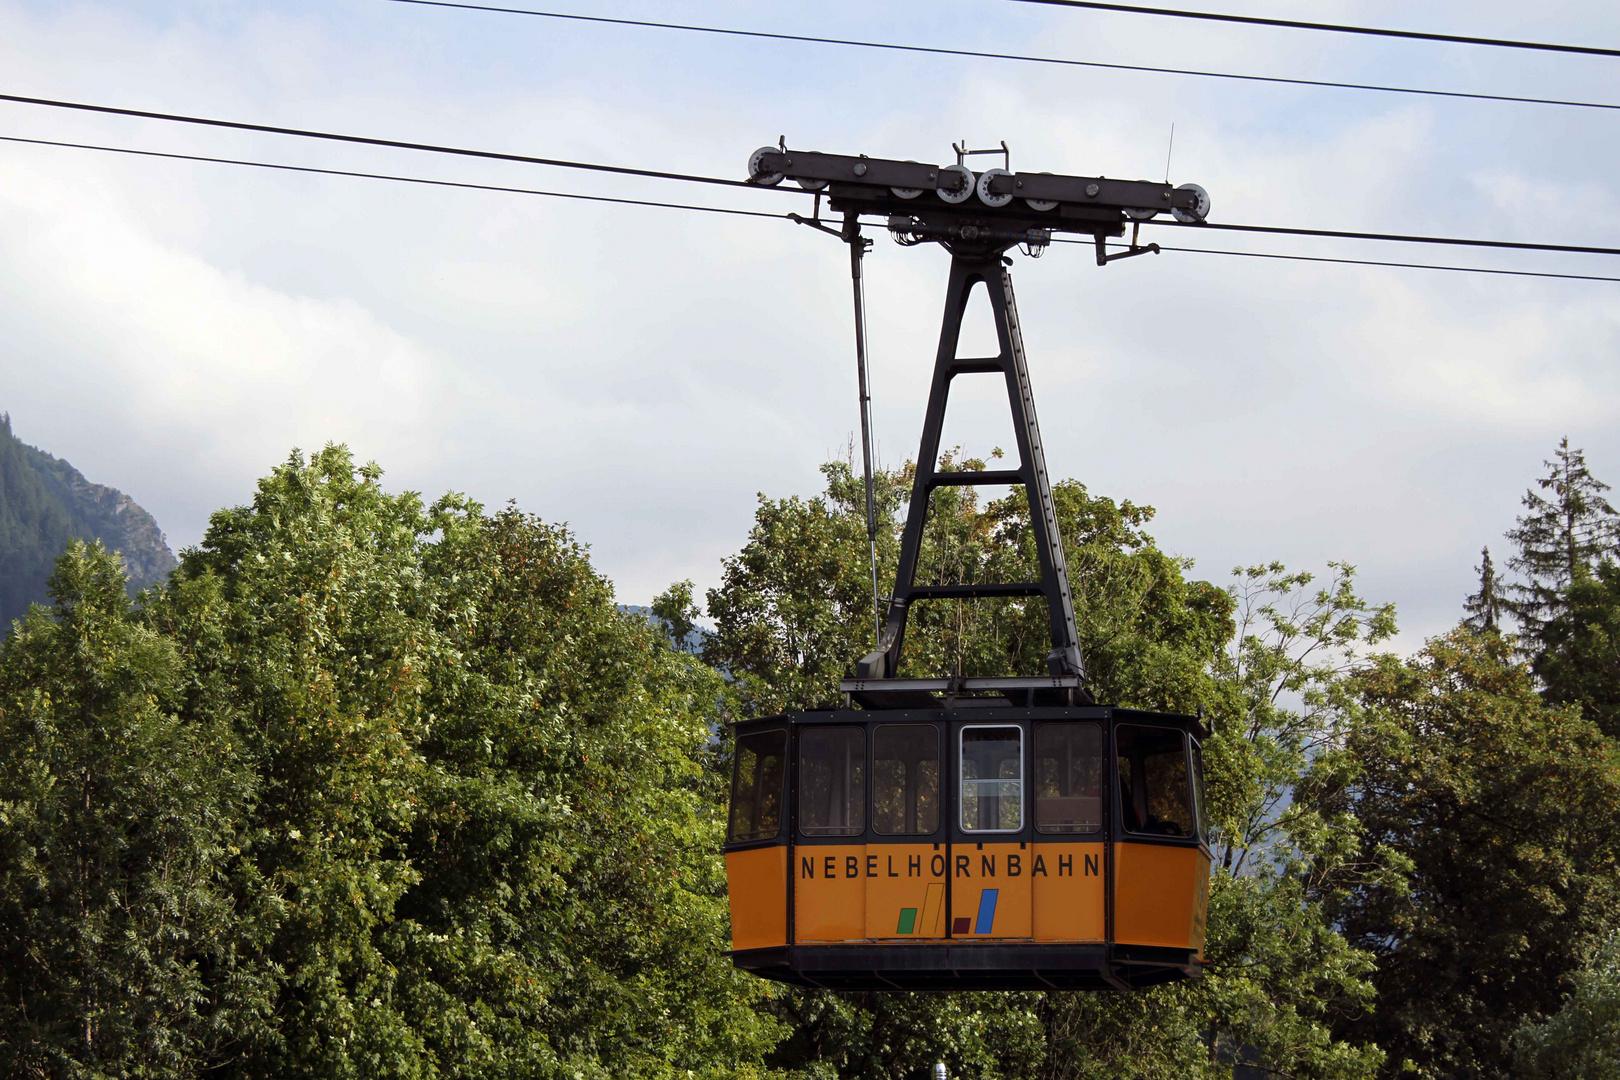 Nebelhornbahn in Oberstdorf